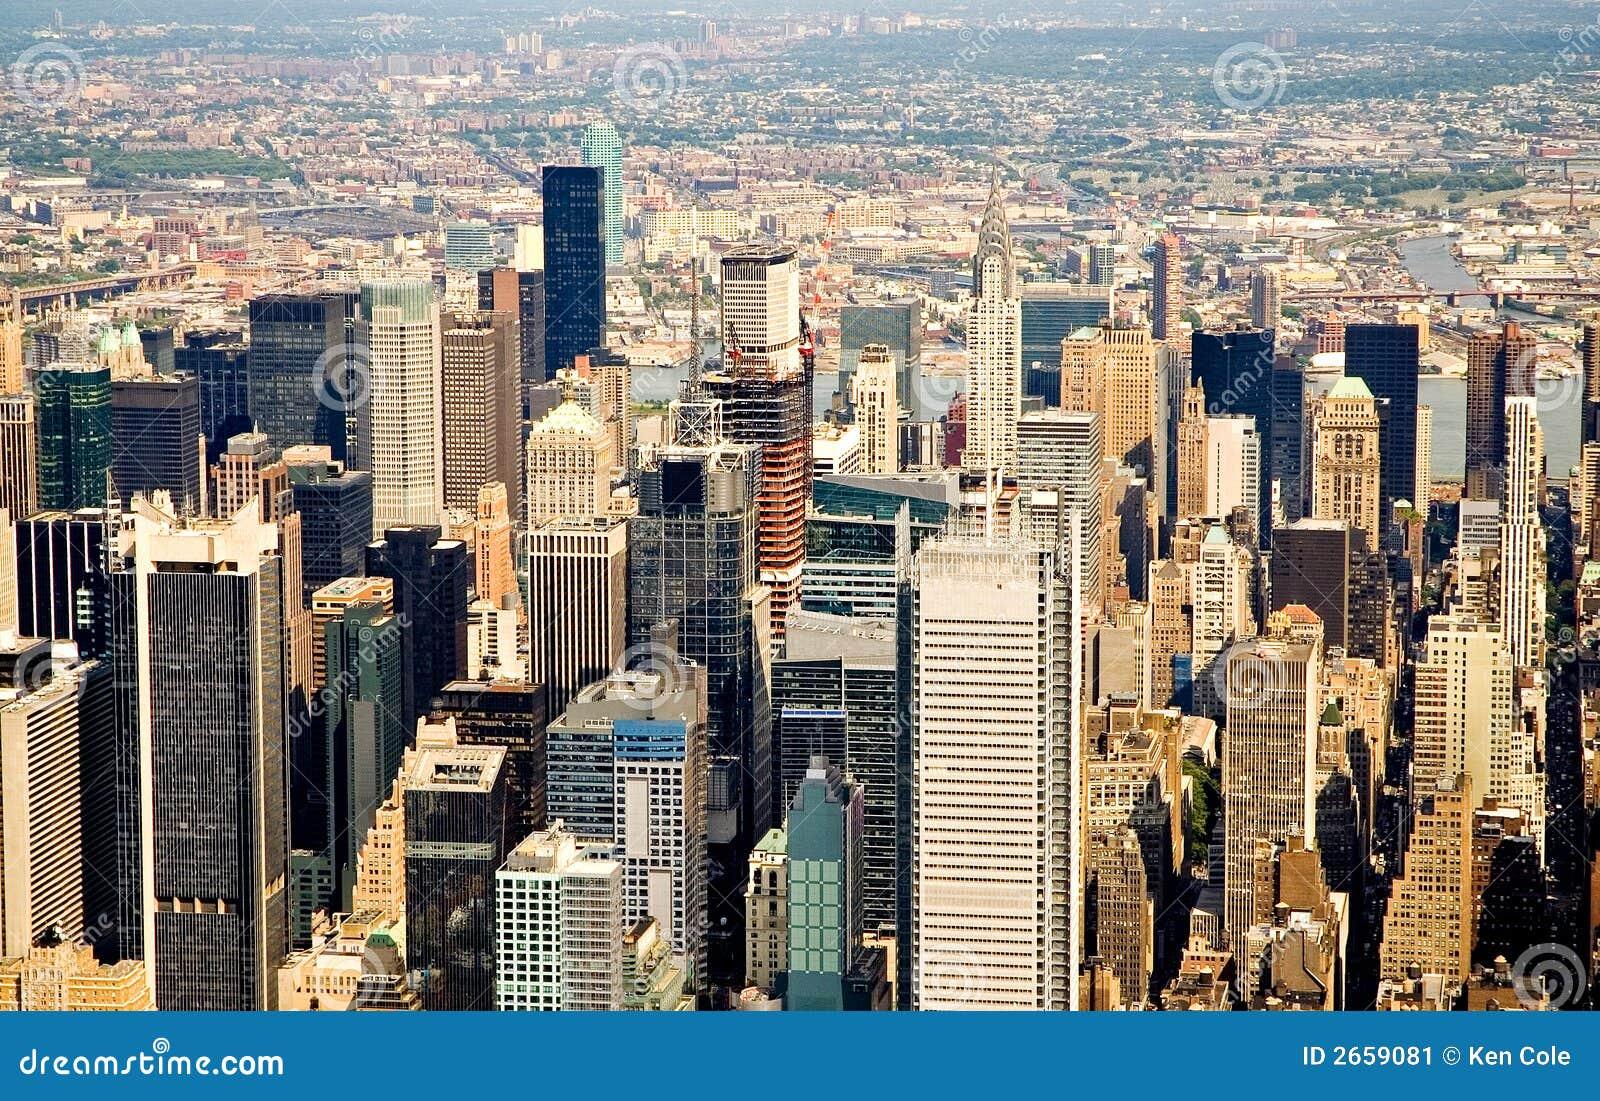 Voler au-dessus de New York City